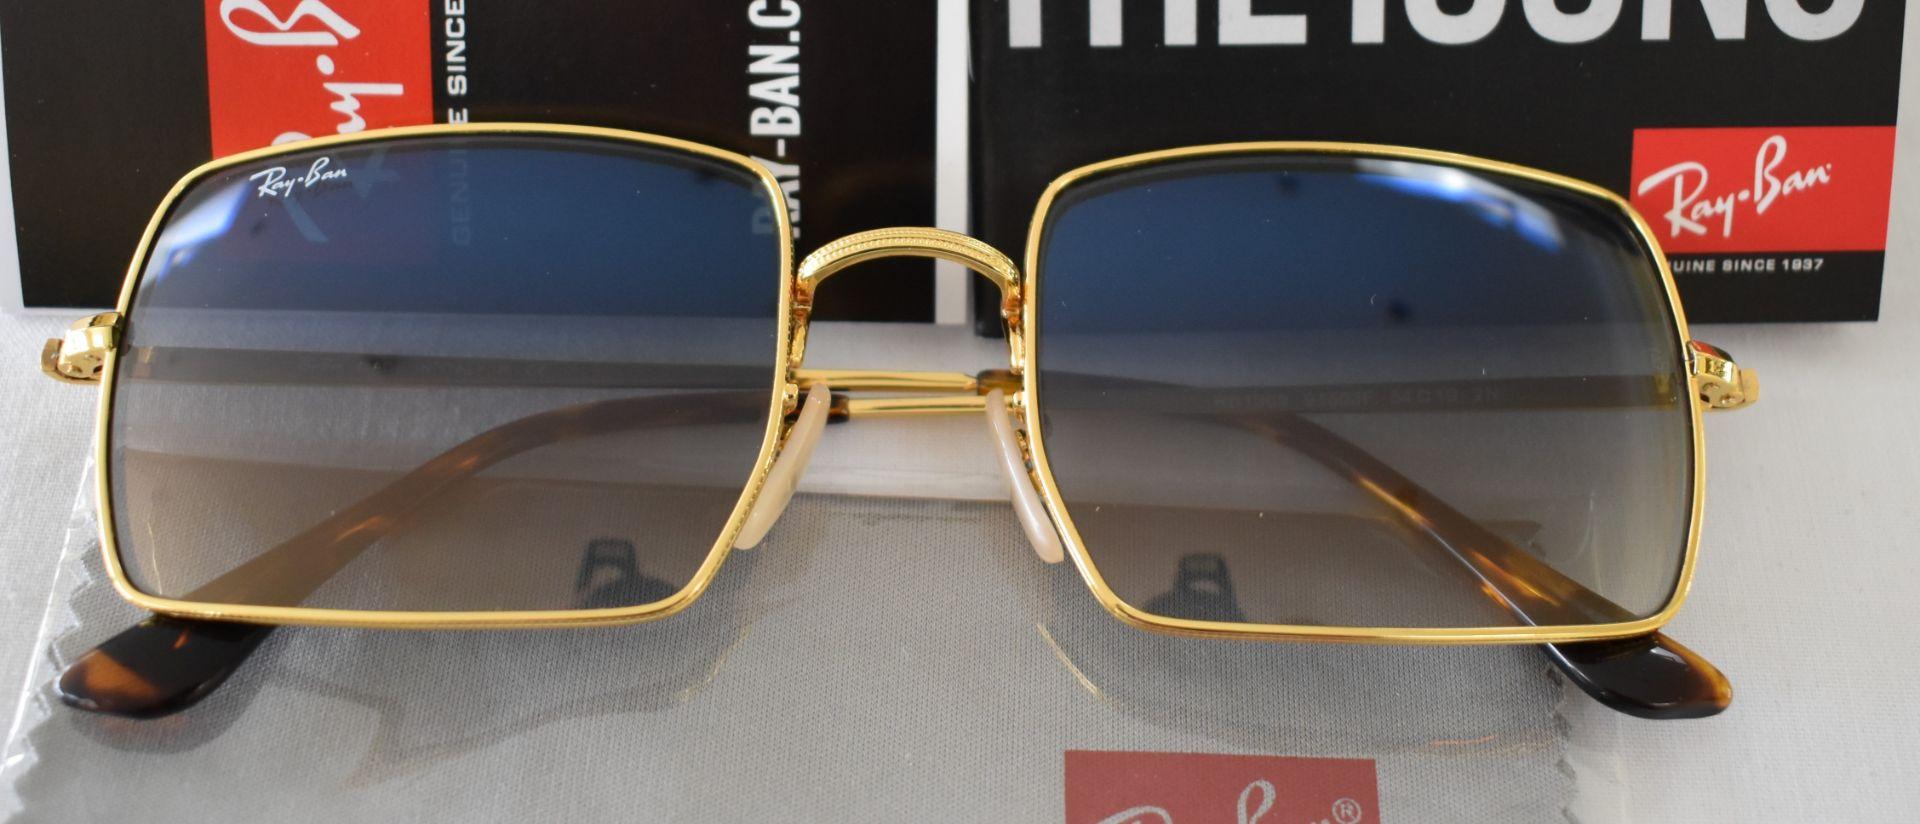 Ray Ban Sunglasses ORB1969 91503F *3N - Image 2 of 3